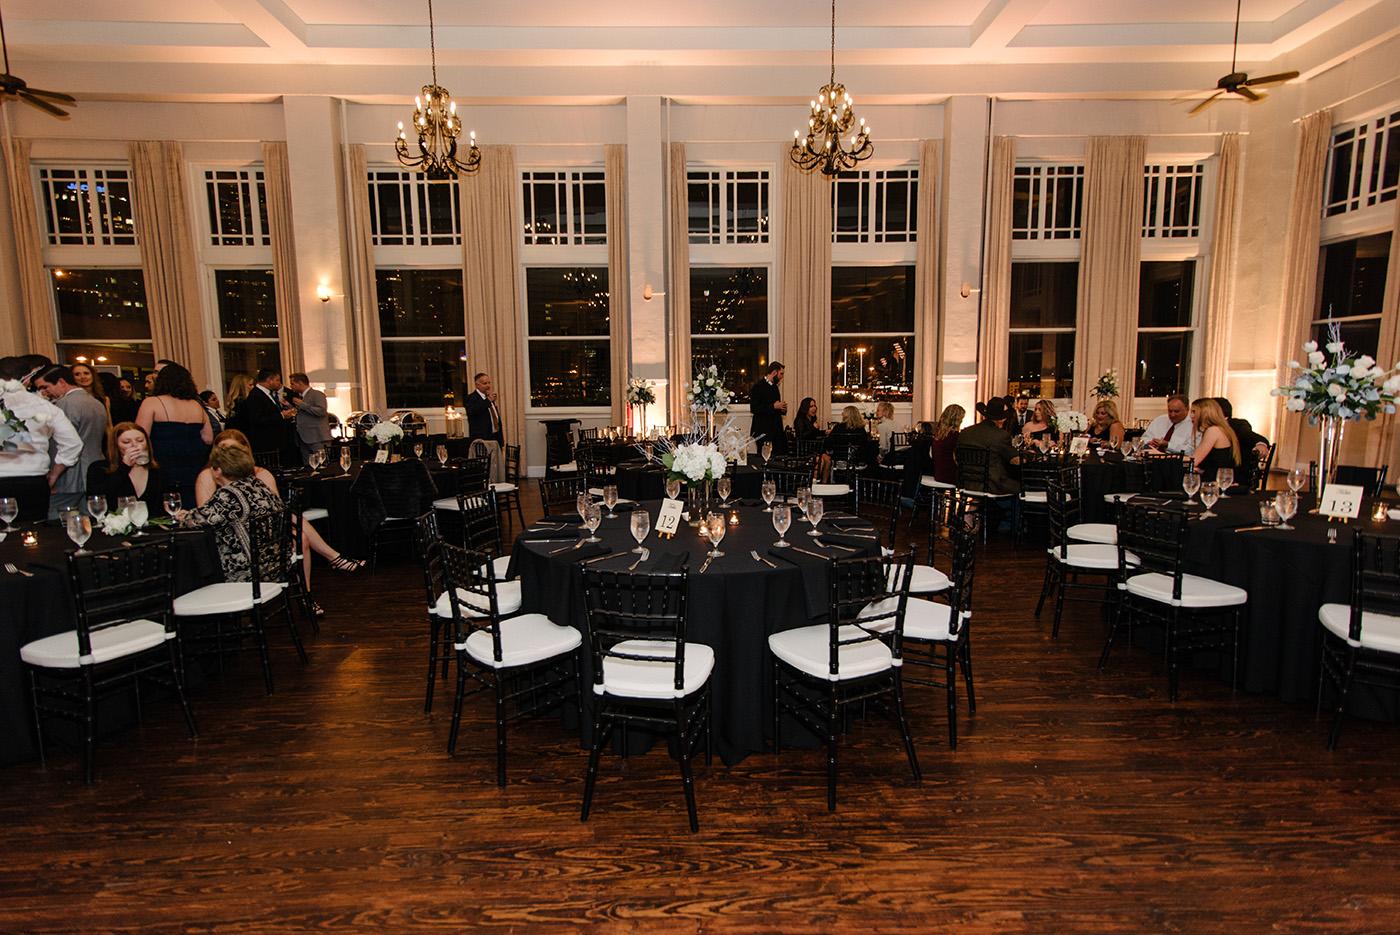 Dallas Wedding Planner - Winter Wedding at The Room on Main - Allday Events - 19.jpg